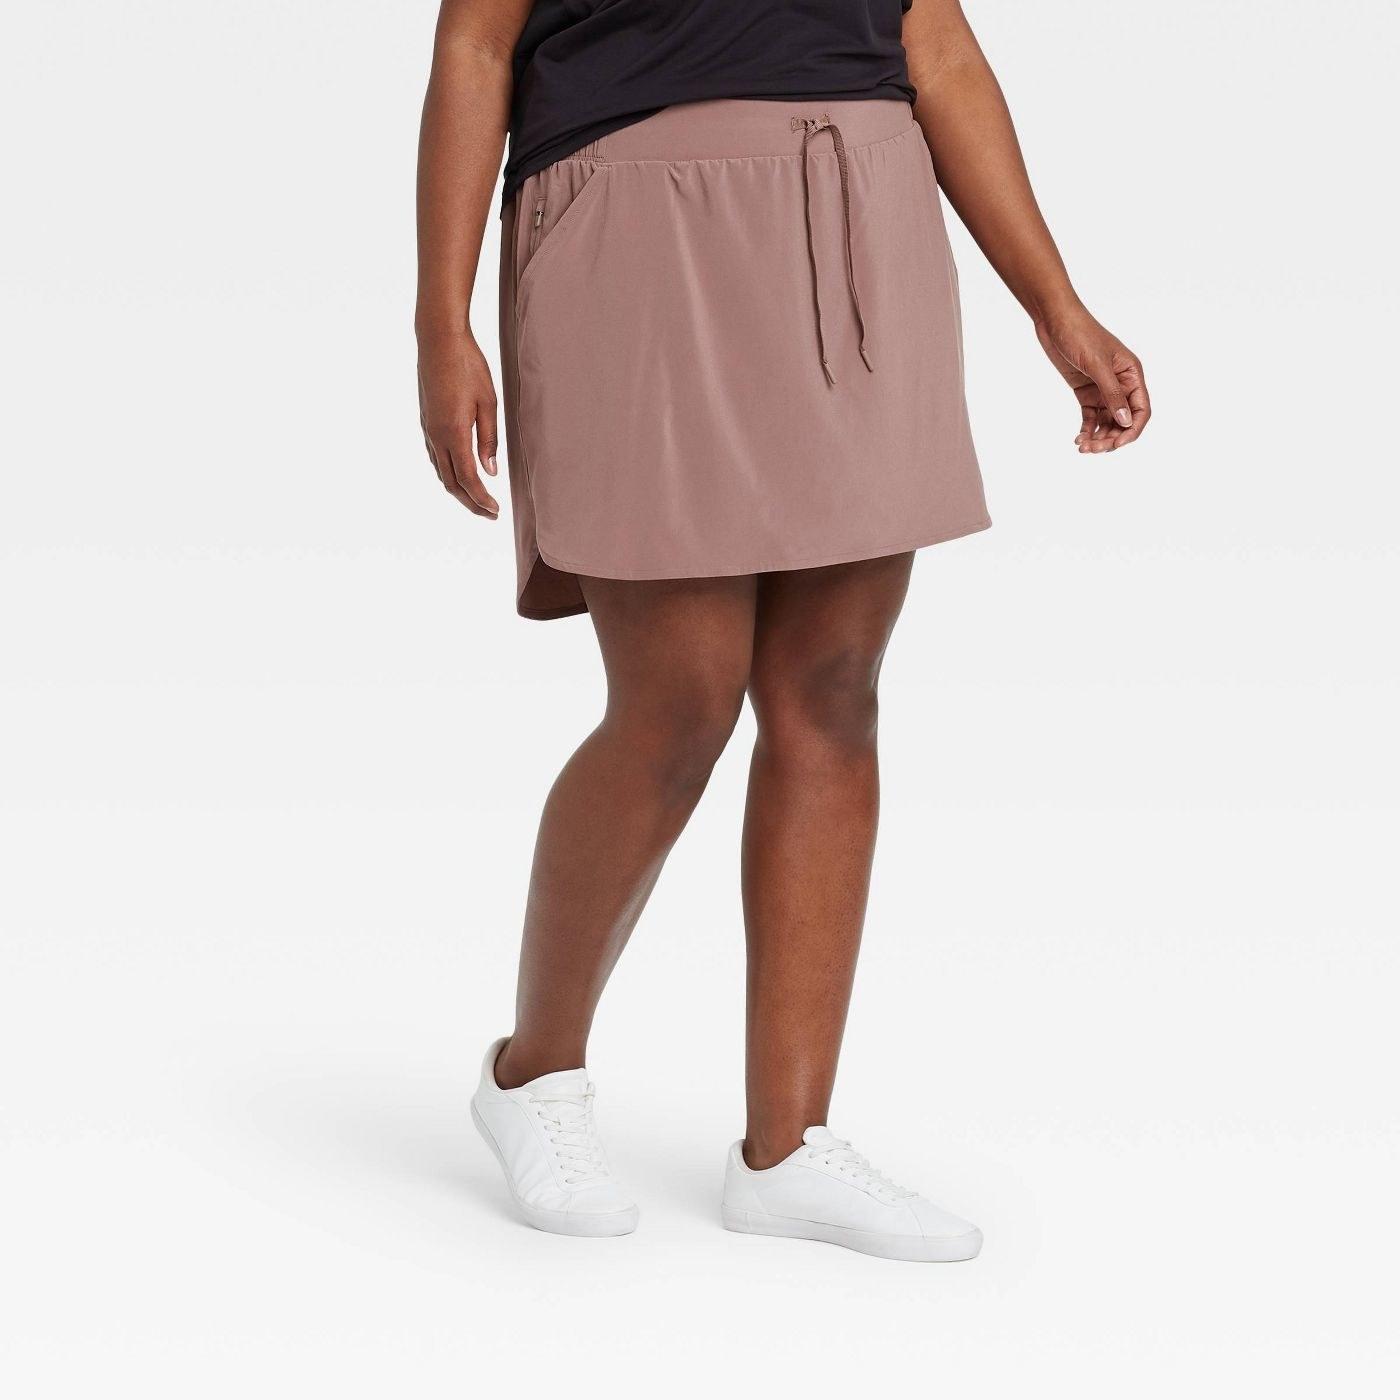 Model in stretch skort